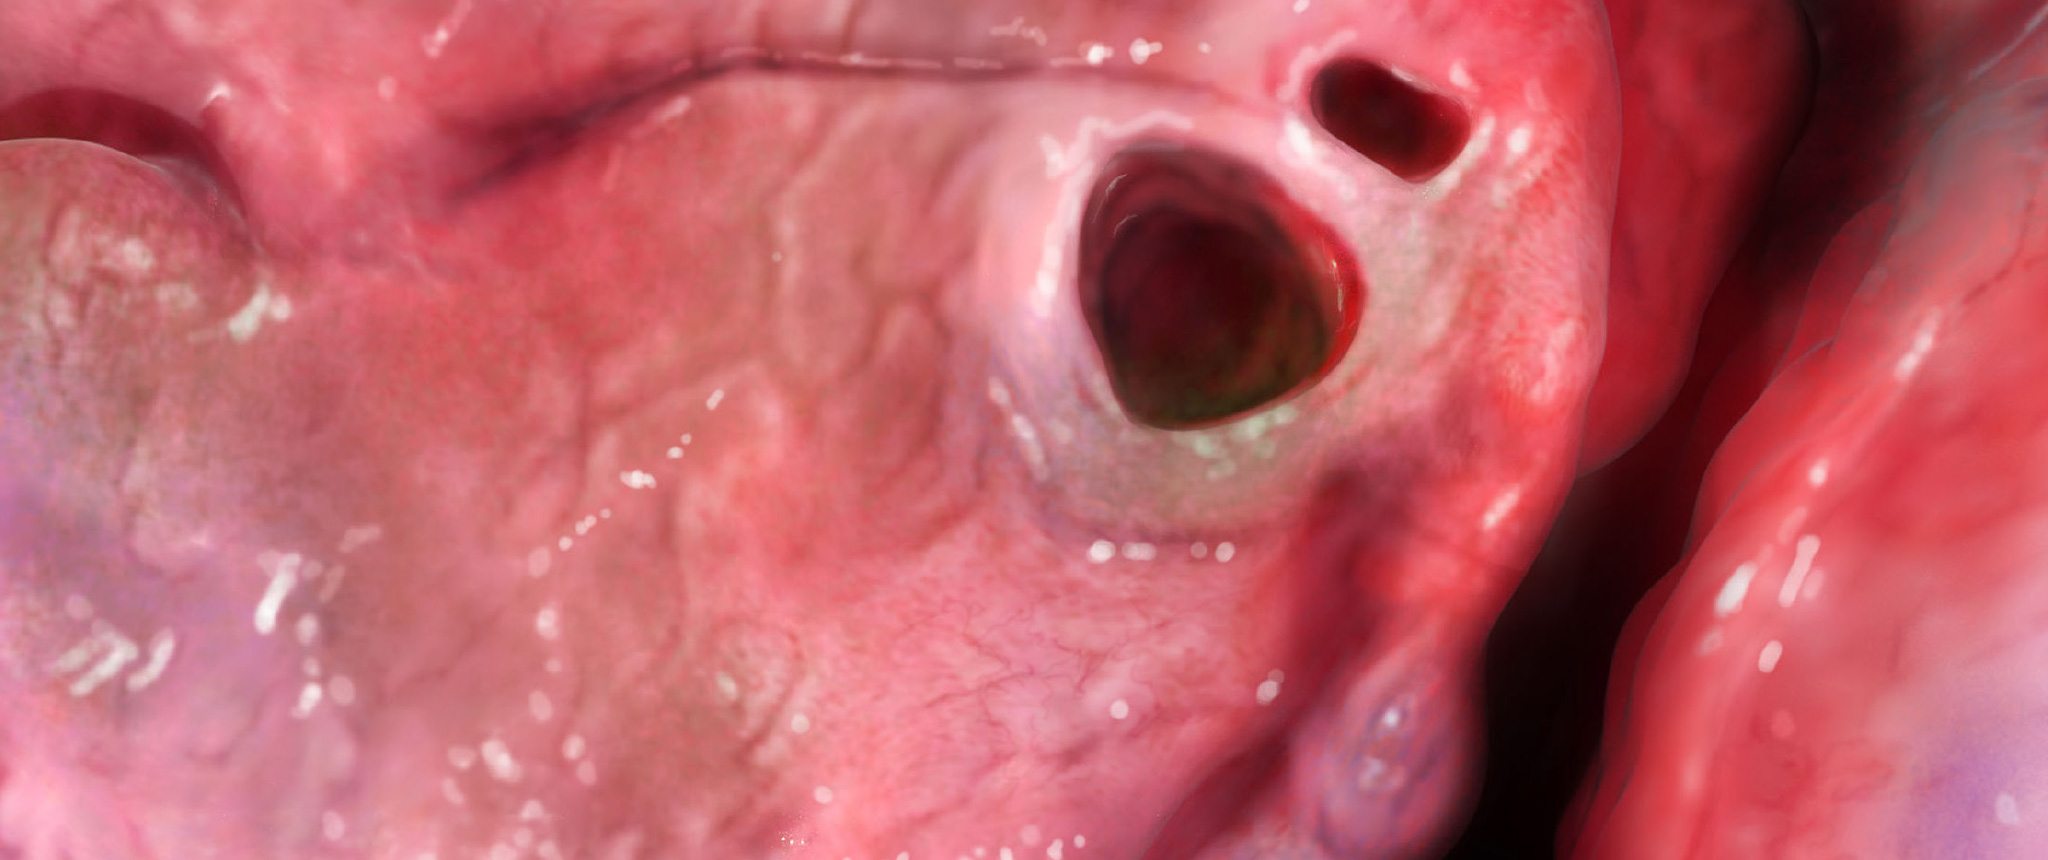 cystic fibrosis - photo #21